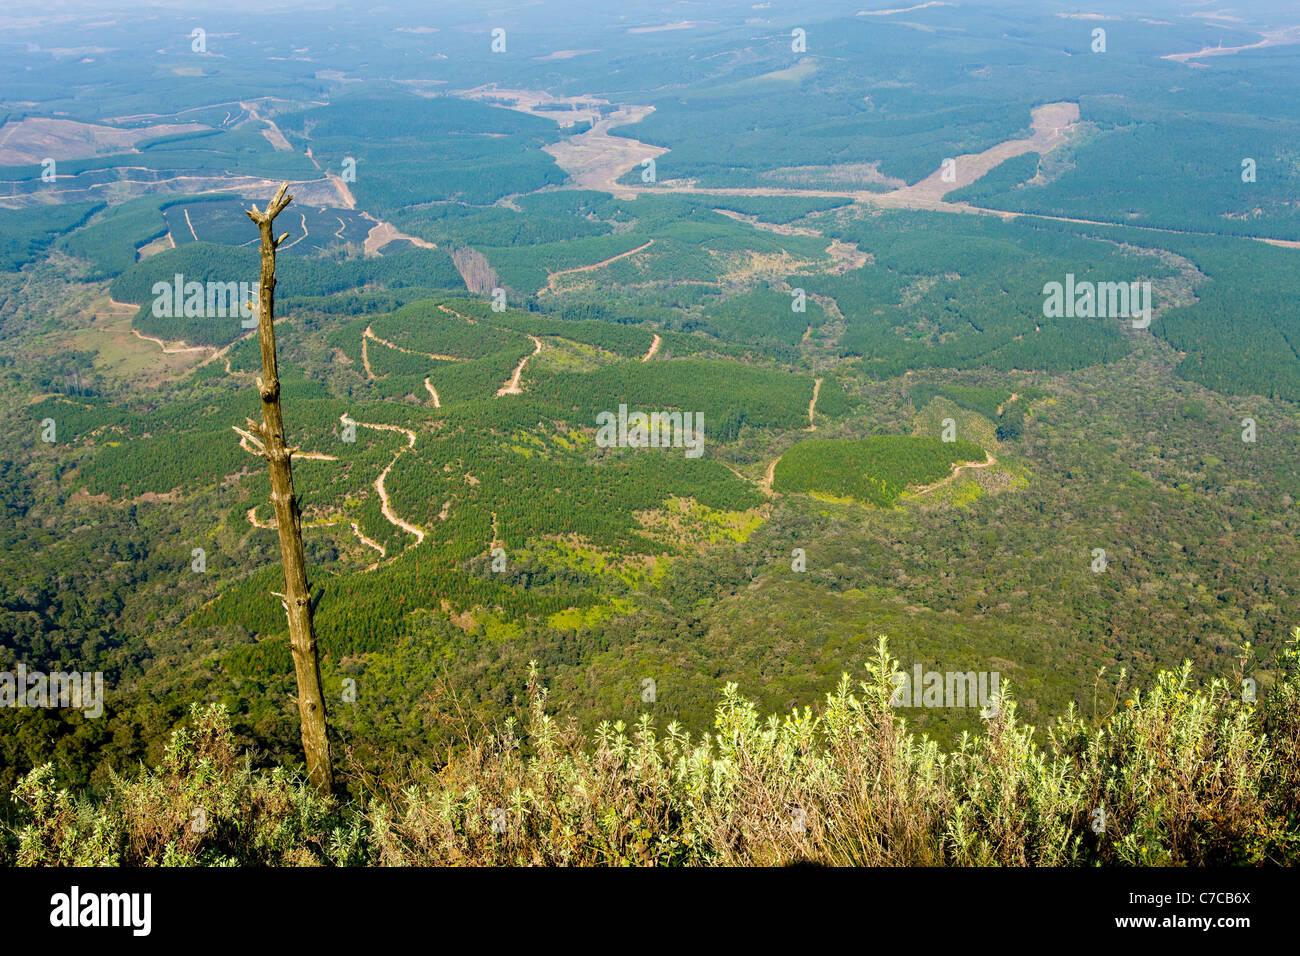 Wonder View Drakensberg of Transvaal Mpumalanga ( Transvaal ) South Africa - Stock Image